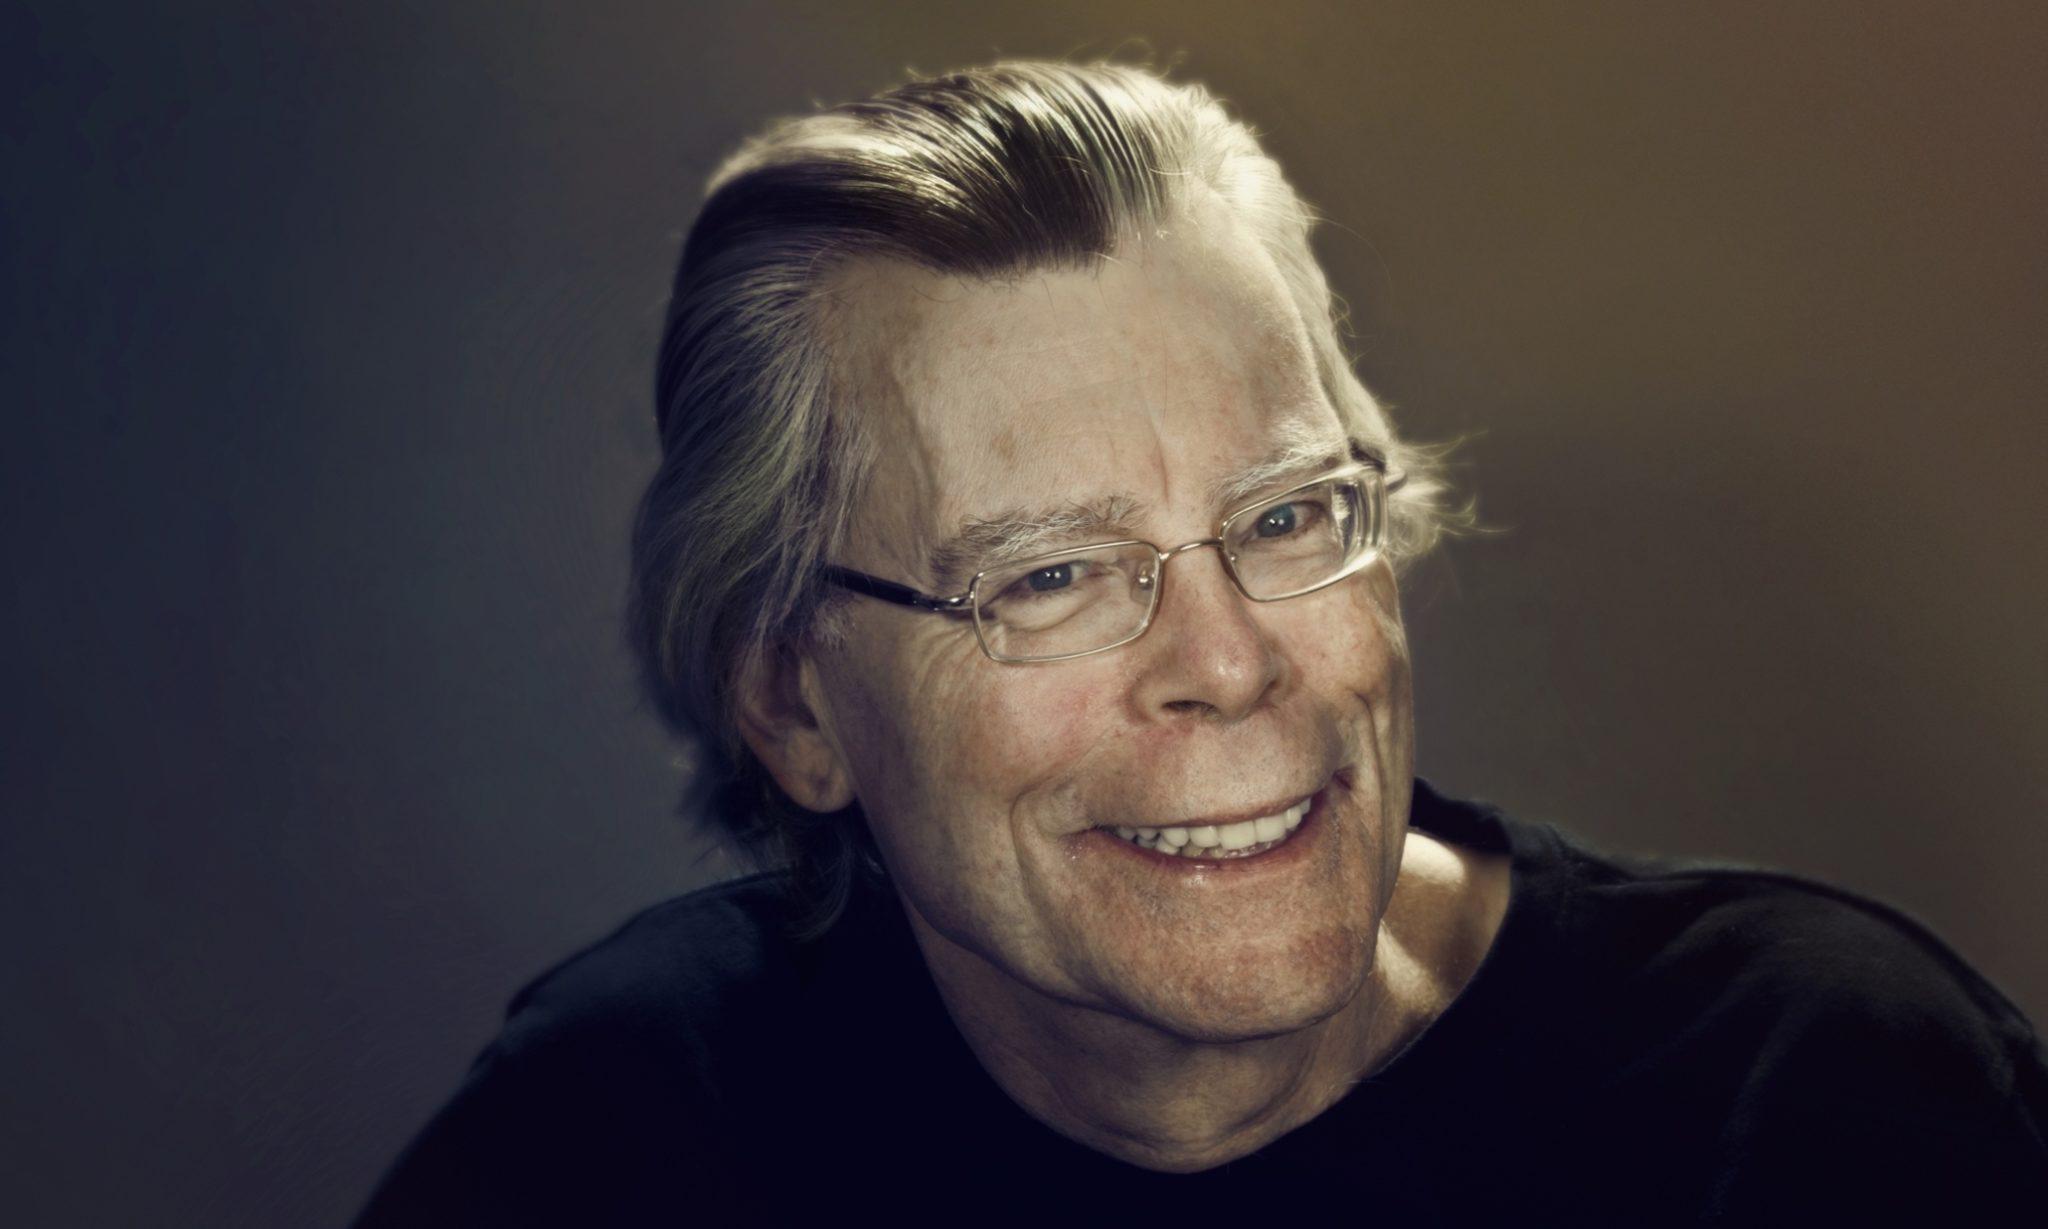 Stephen King e O Iluminado